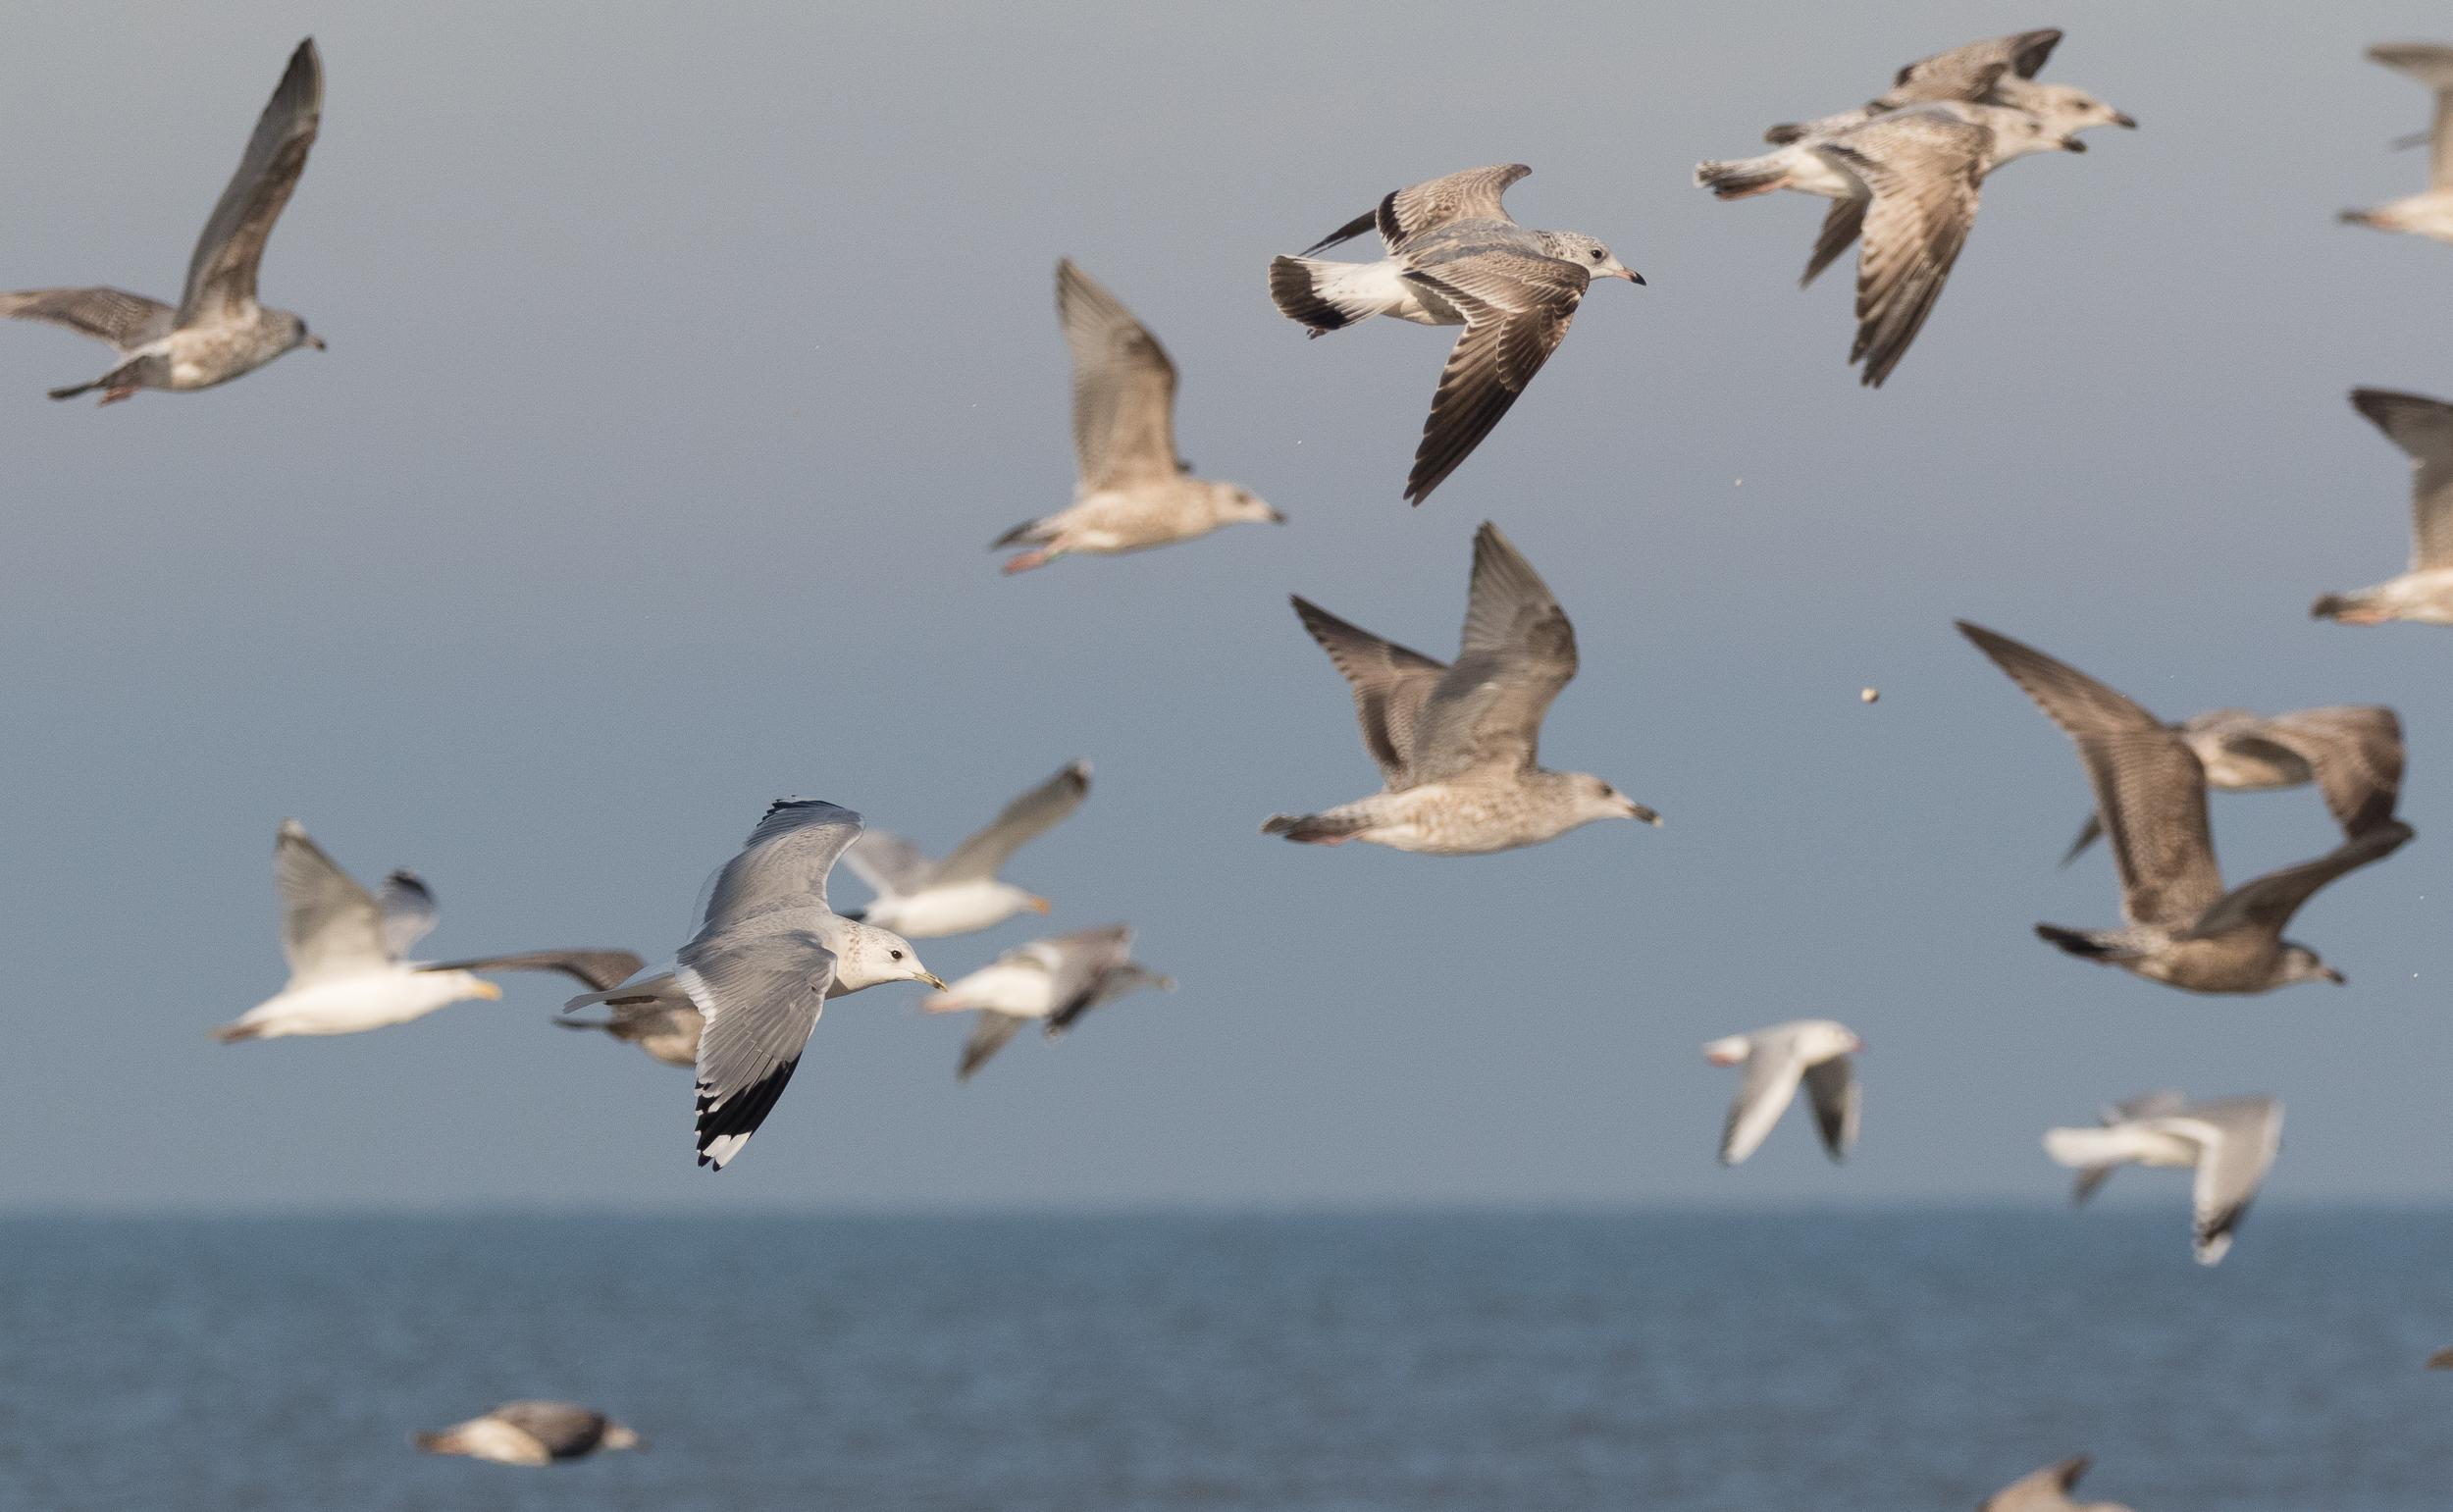 20170121-Common Gull Adult-163.jpg